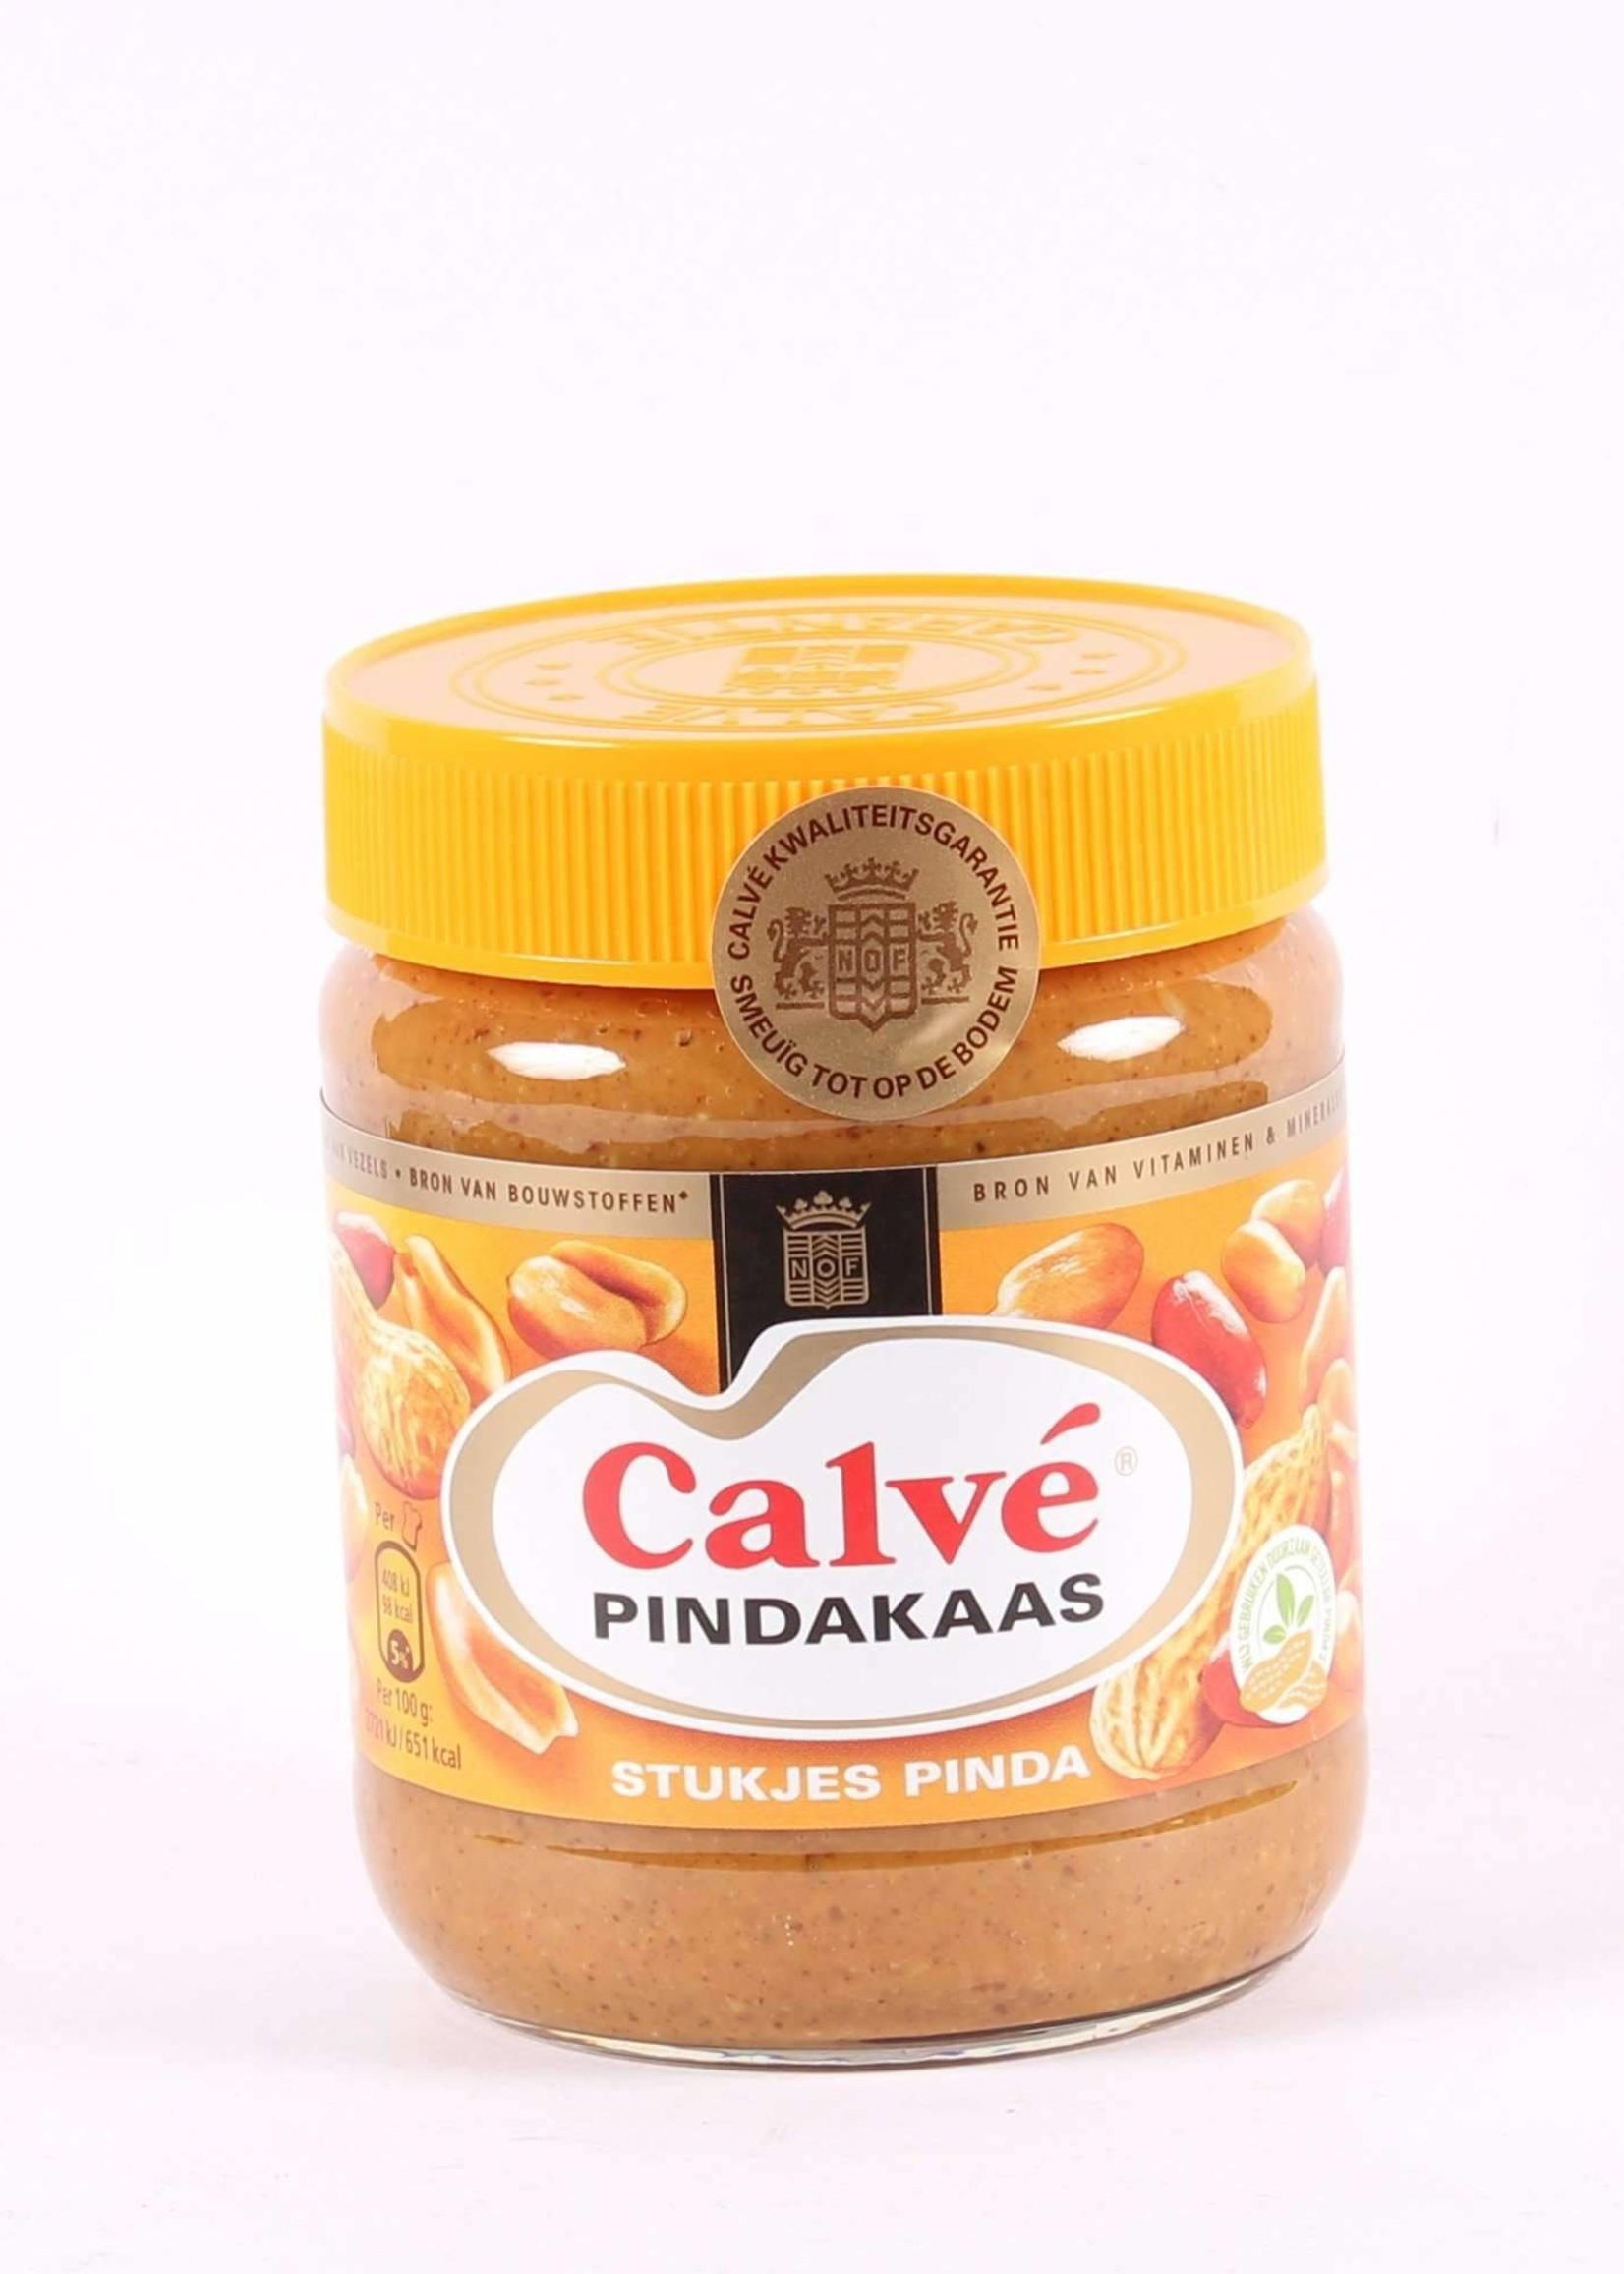 Calvé Pindakaas with Peanutpieces, Dutch Peanutbutter